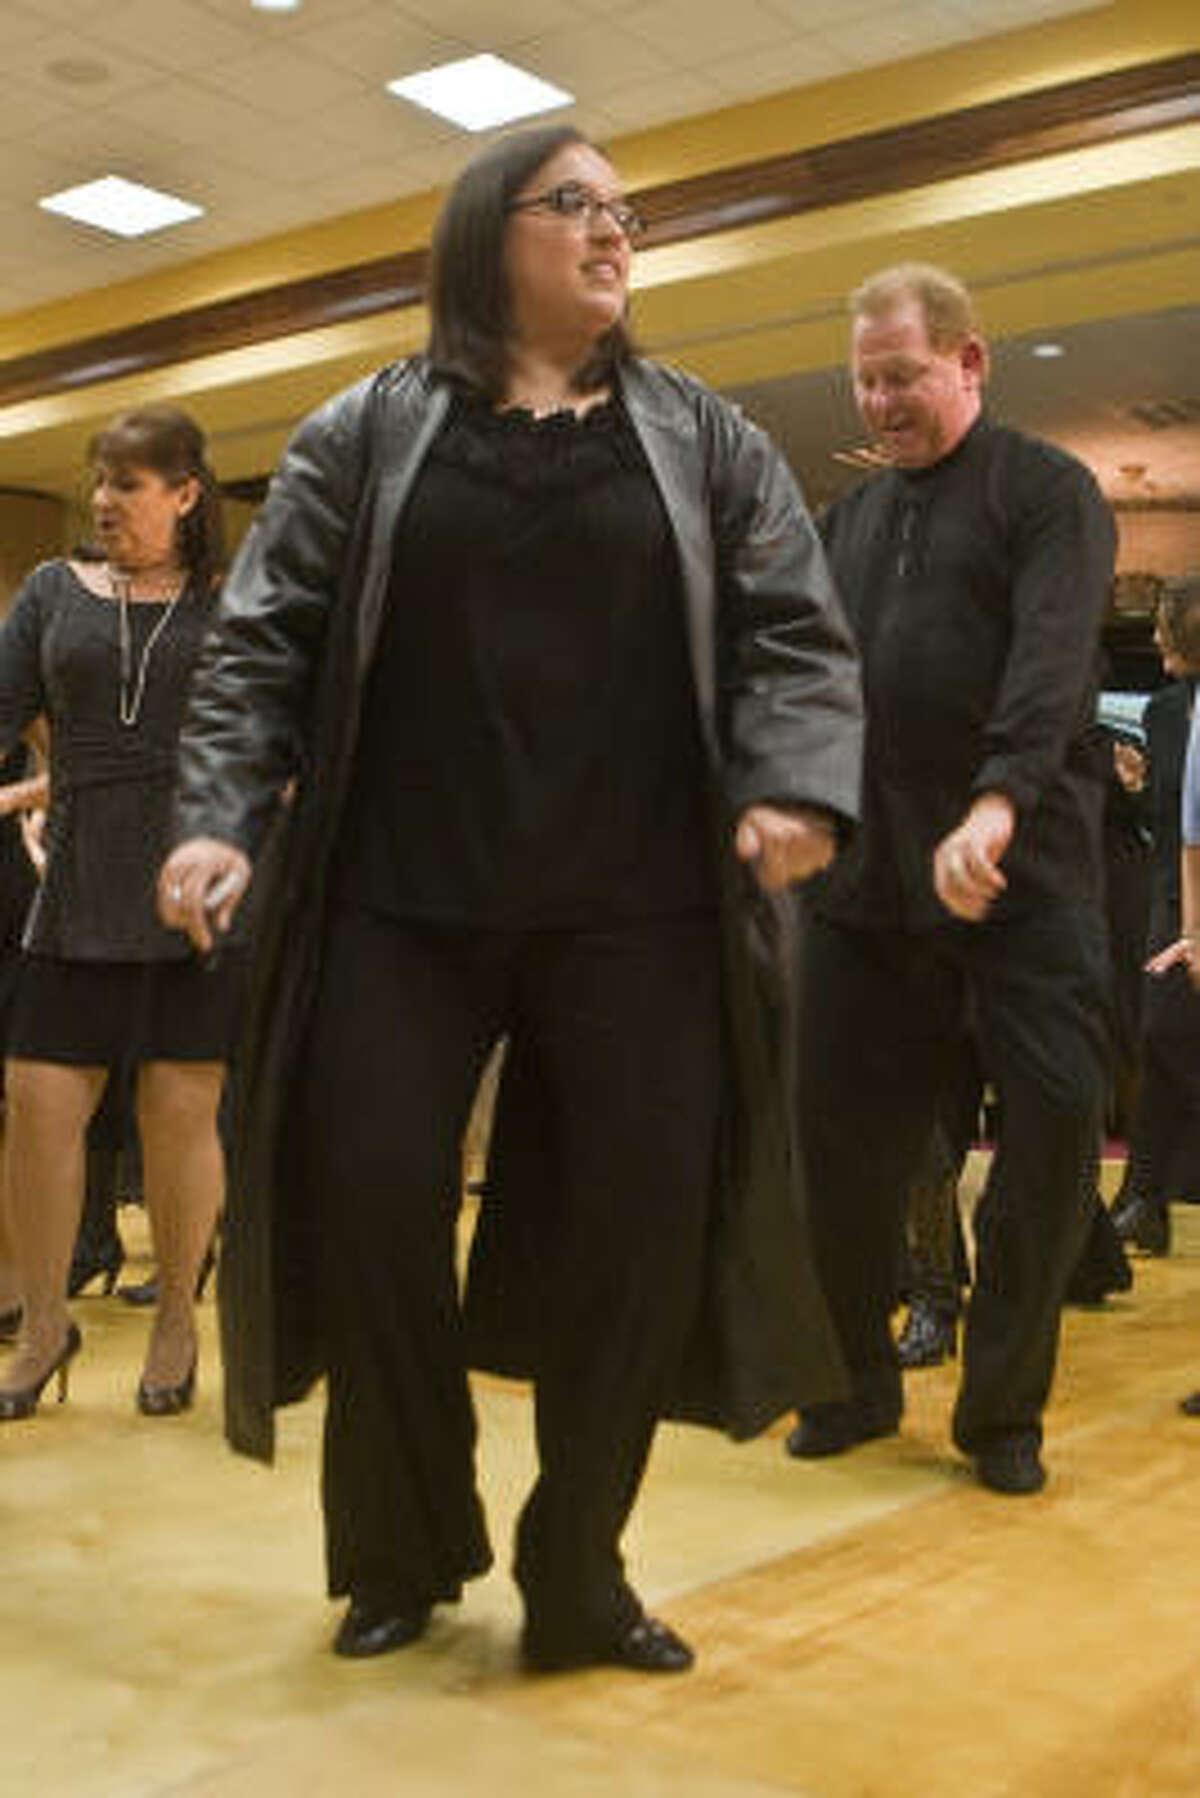 DANCING WITH THE PRINCIPALS: Tiffany Espinoza of Pasadena was one of dozens of guests who joined in on a warmup dance at Pasadena ISD's